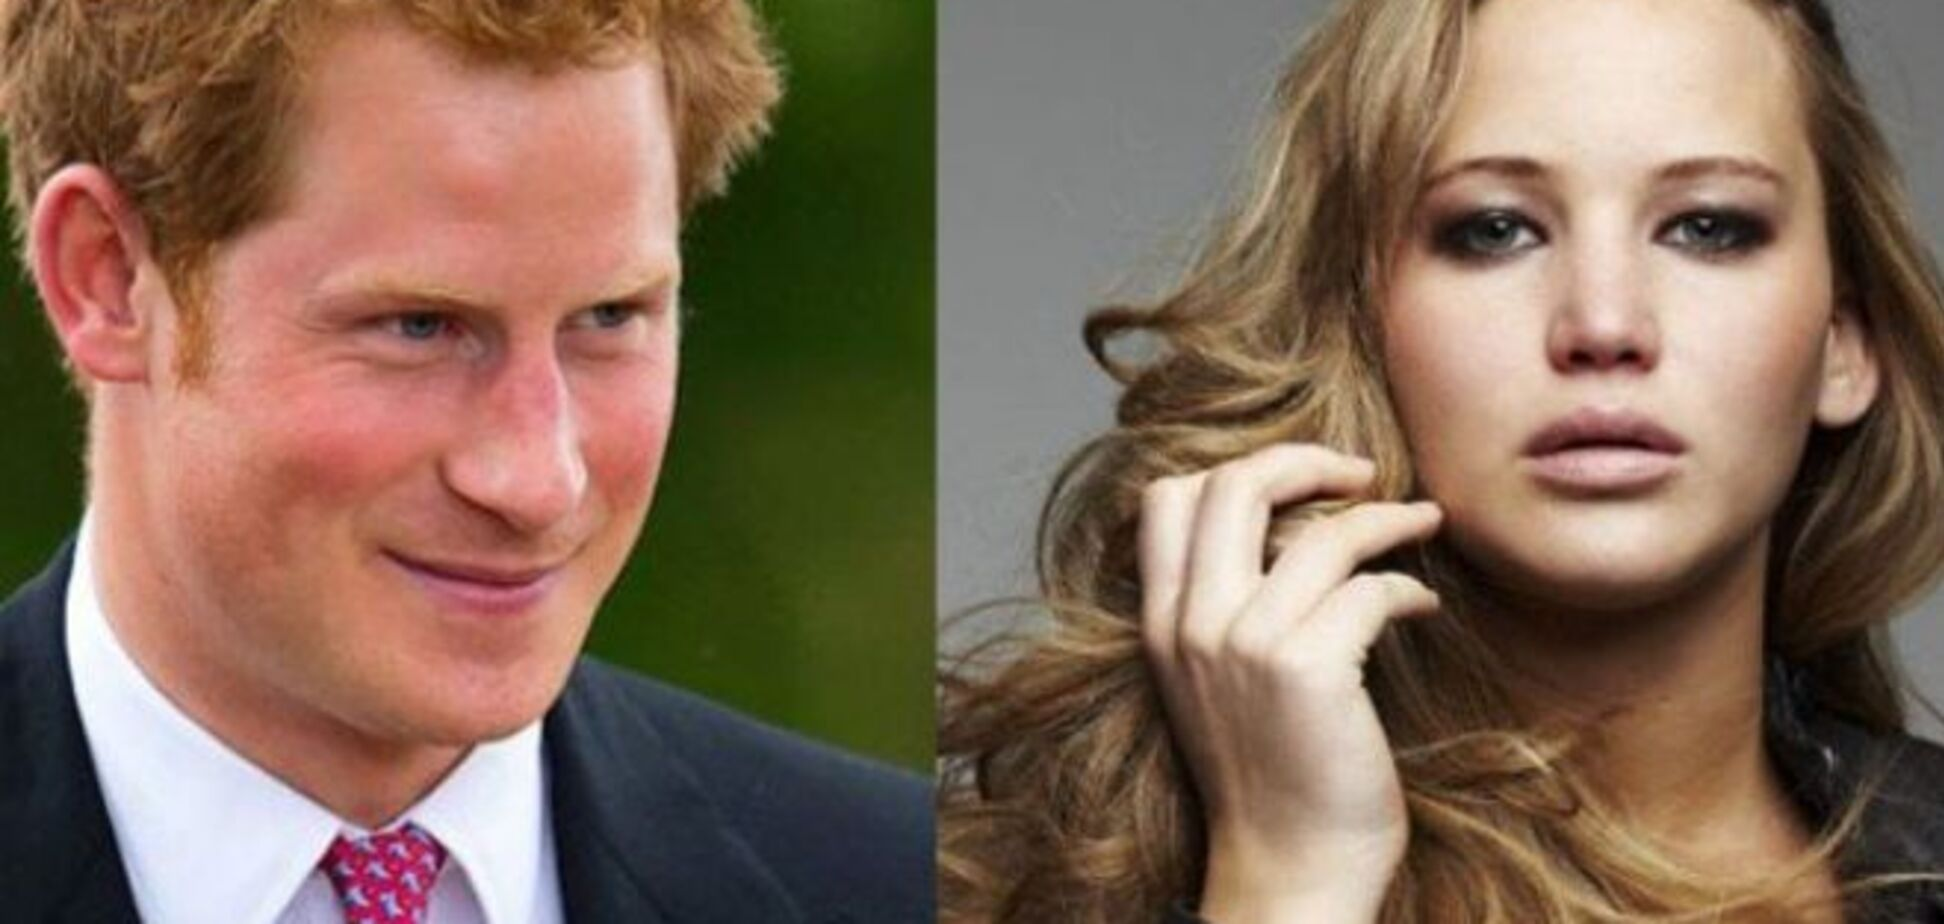 Дженнифер Лоуренс отвергла принца Гарри